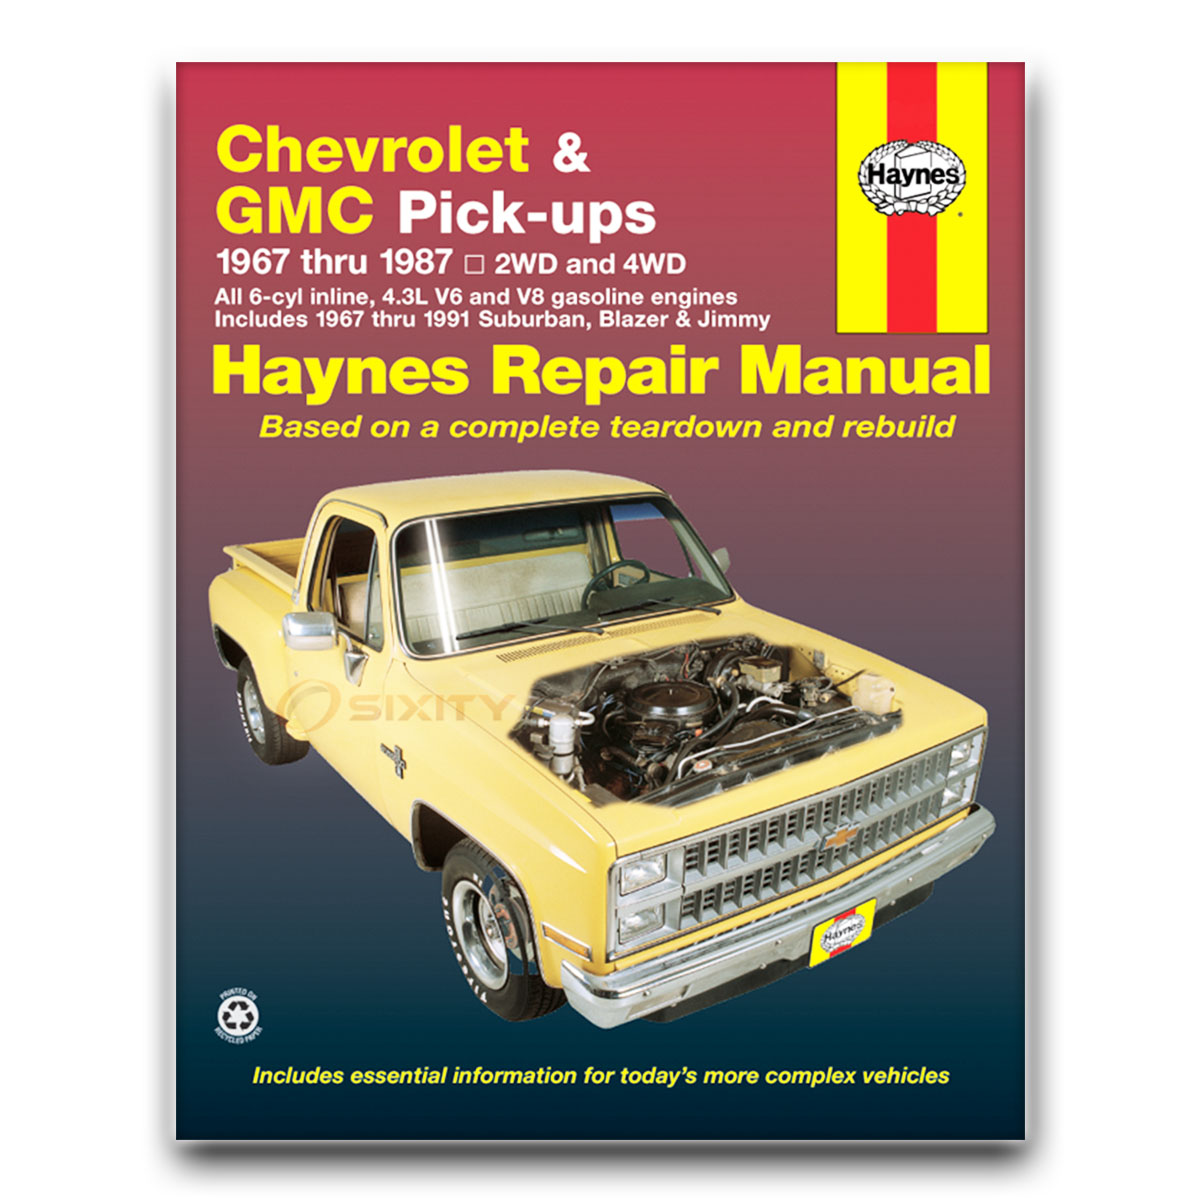 chevy k5 blazer haynes repair manual deluxe silverado scottsdale rh ebay com 1999 chevy prizm owner's manual 1999 chevy prizm owner's manual